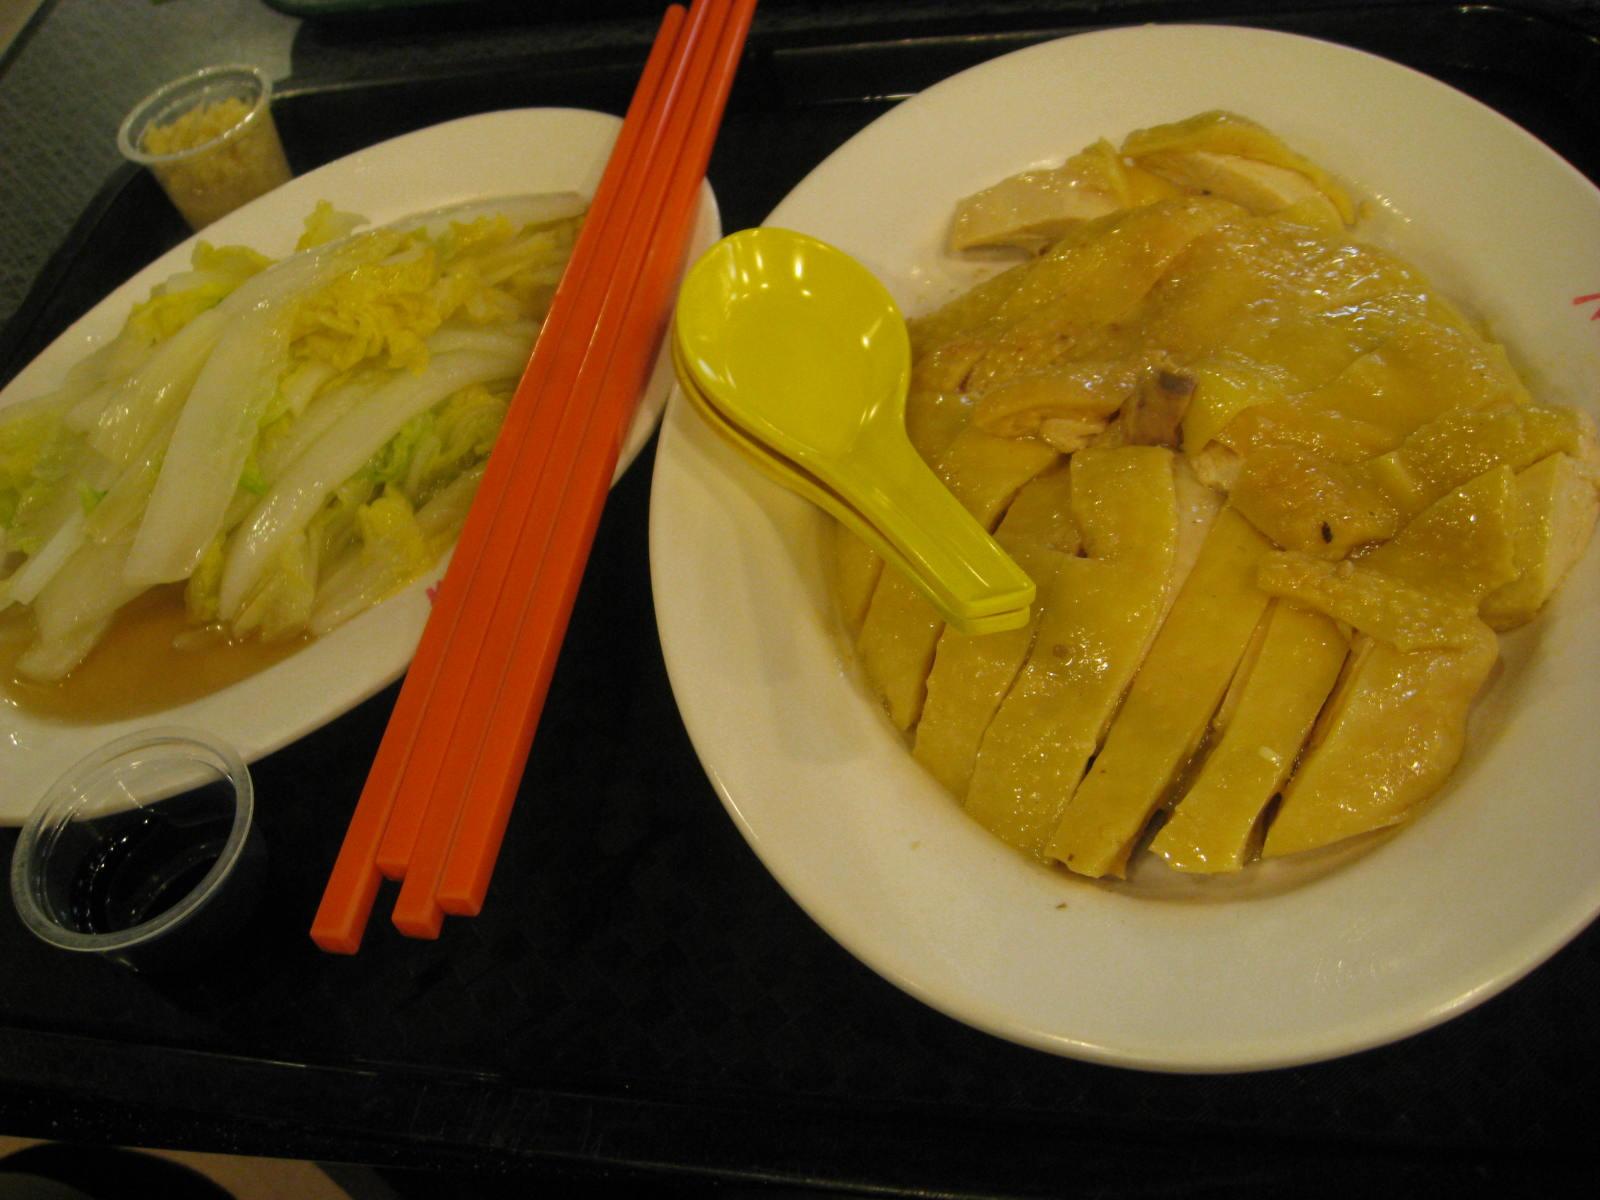 紅磡 – 泰國人海南雞 (koon thai hai nam chicken)   meh